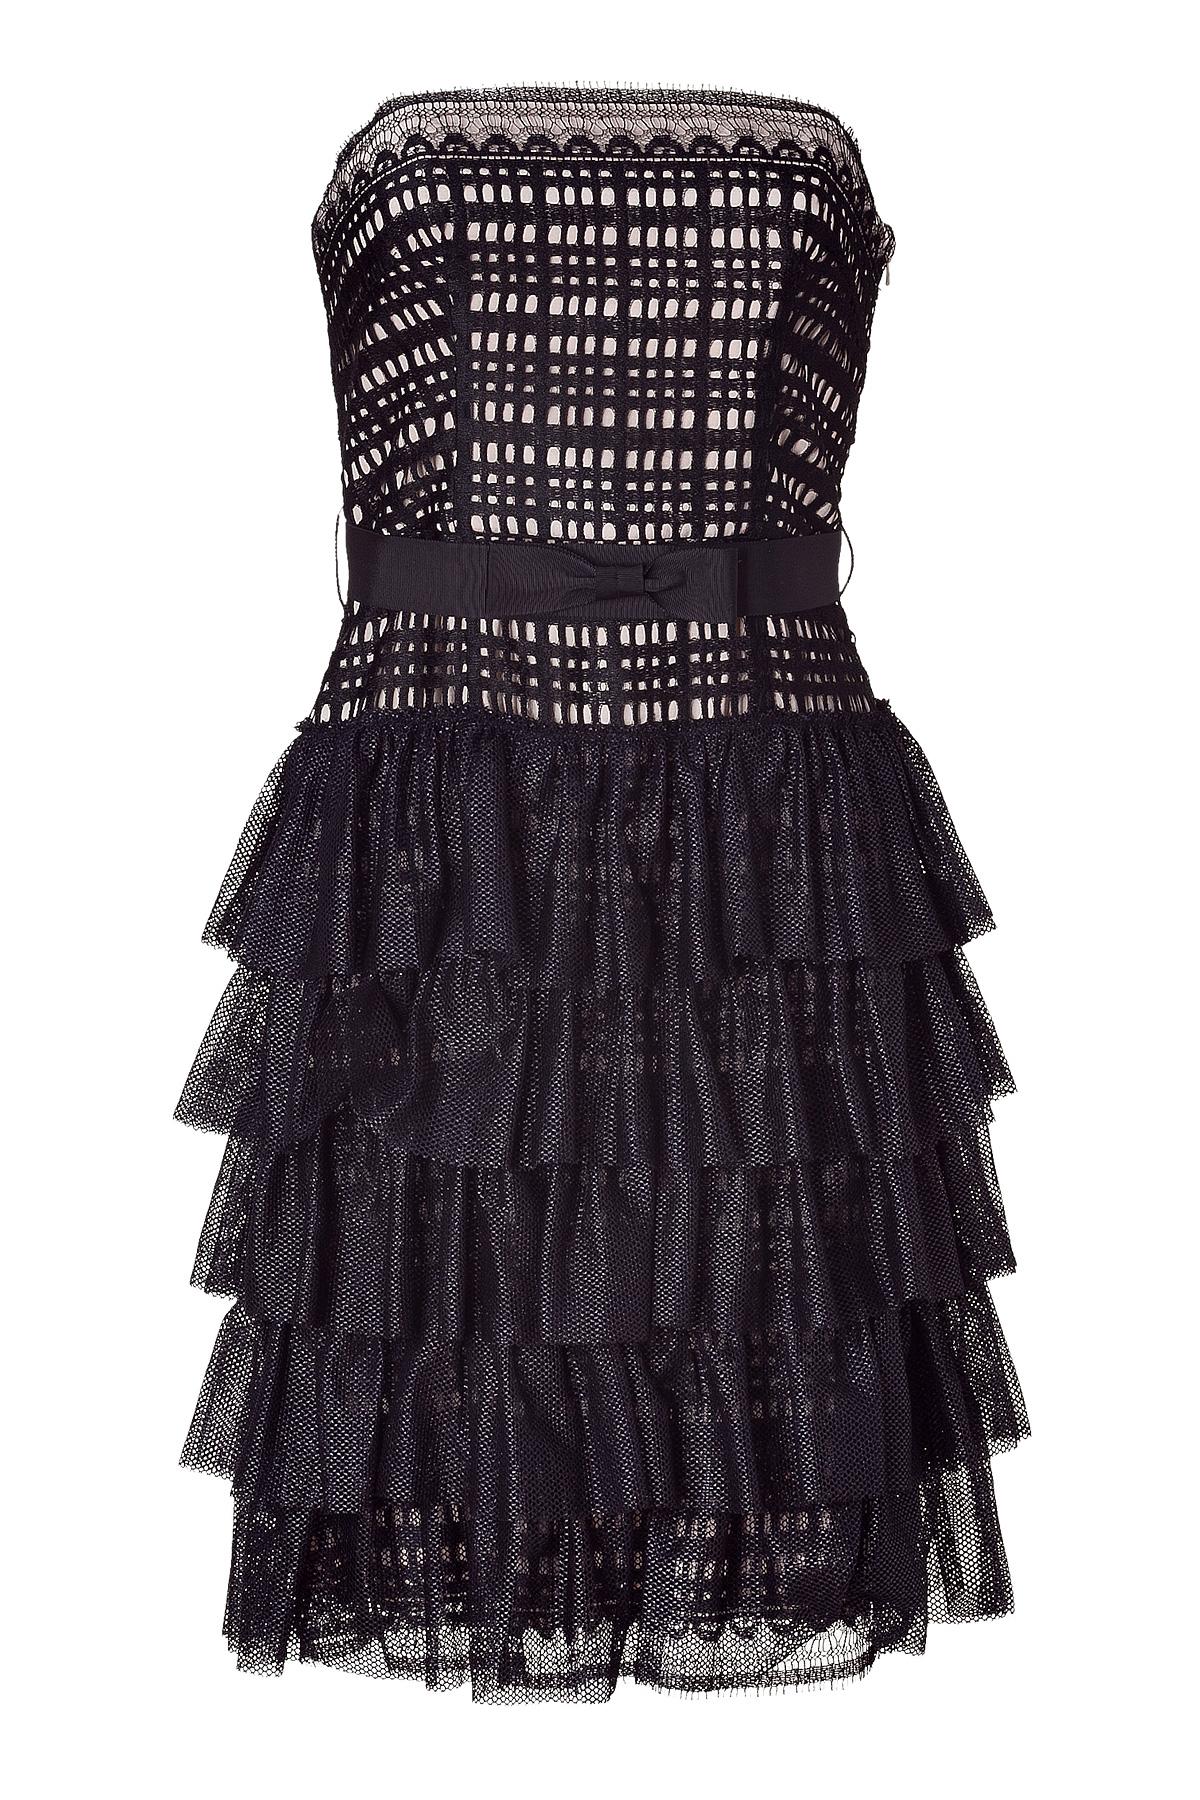 Collette Dinnigan Black Strapless Lace Dress in Black   Lyst